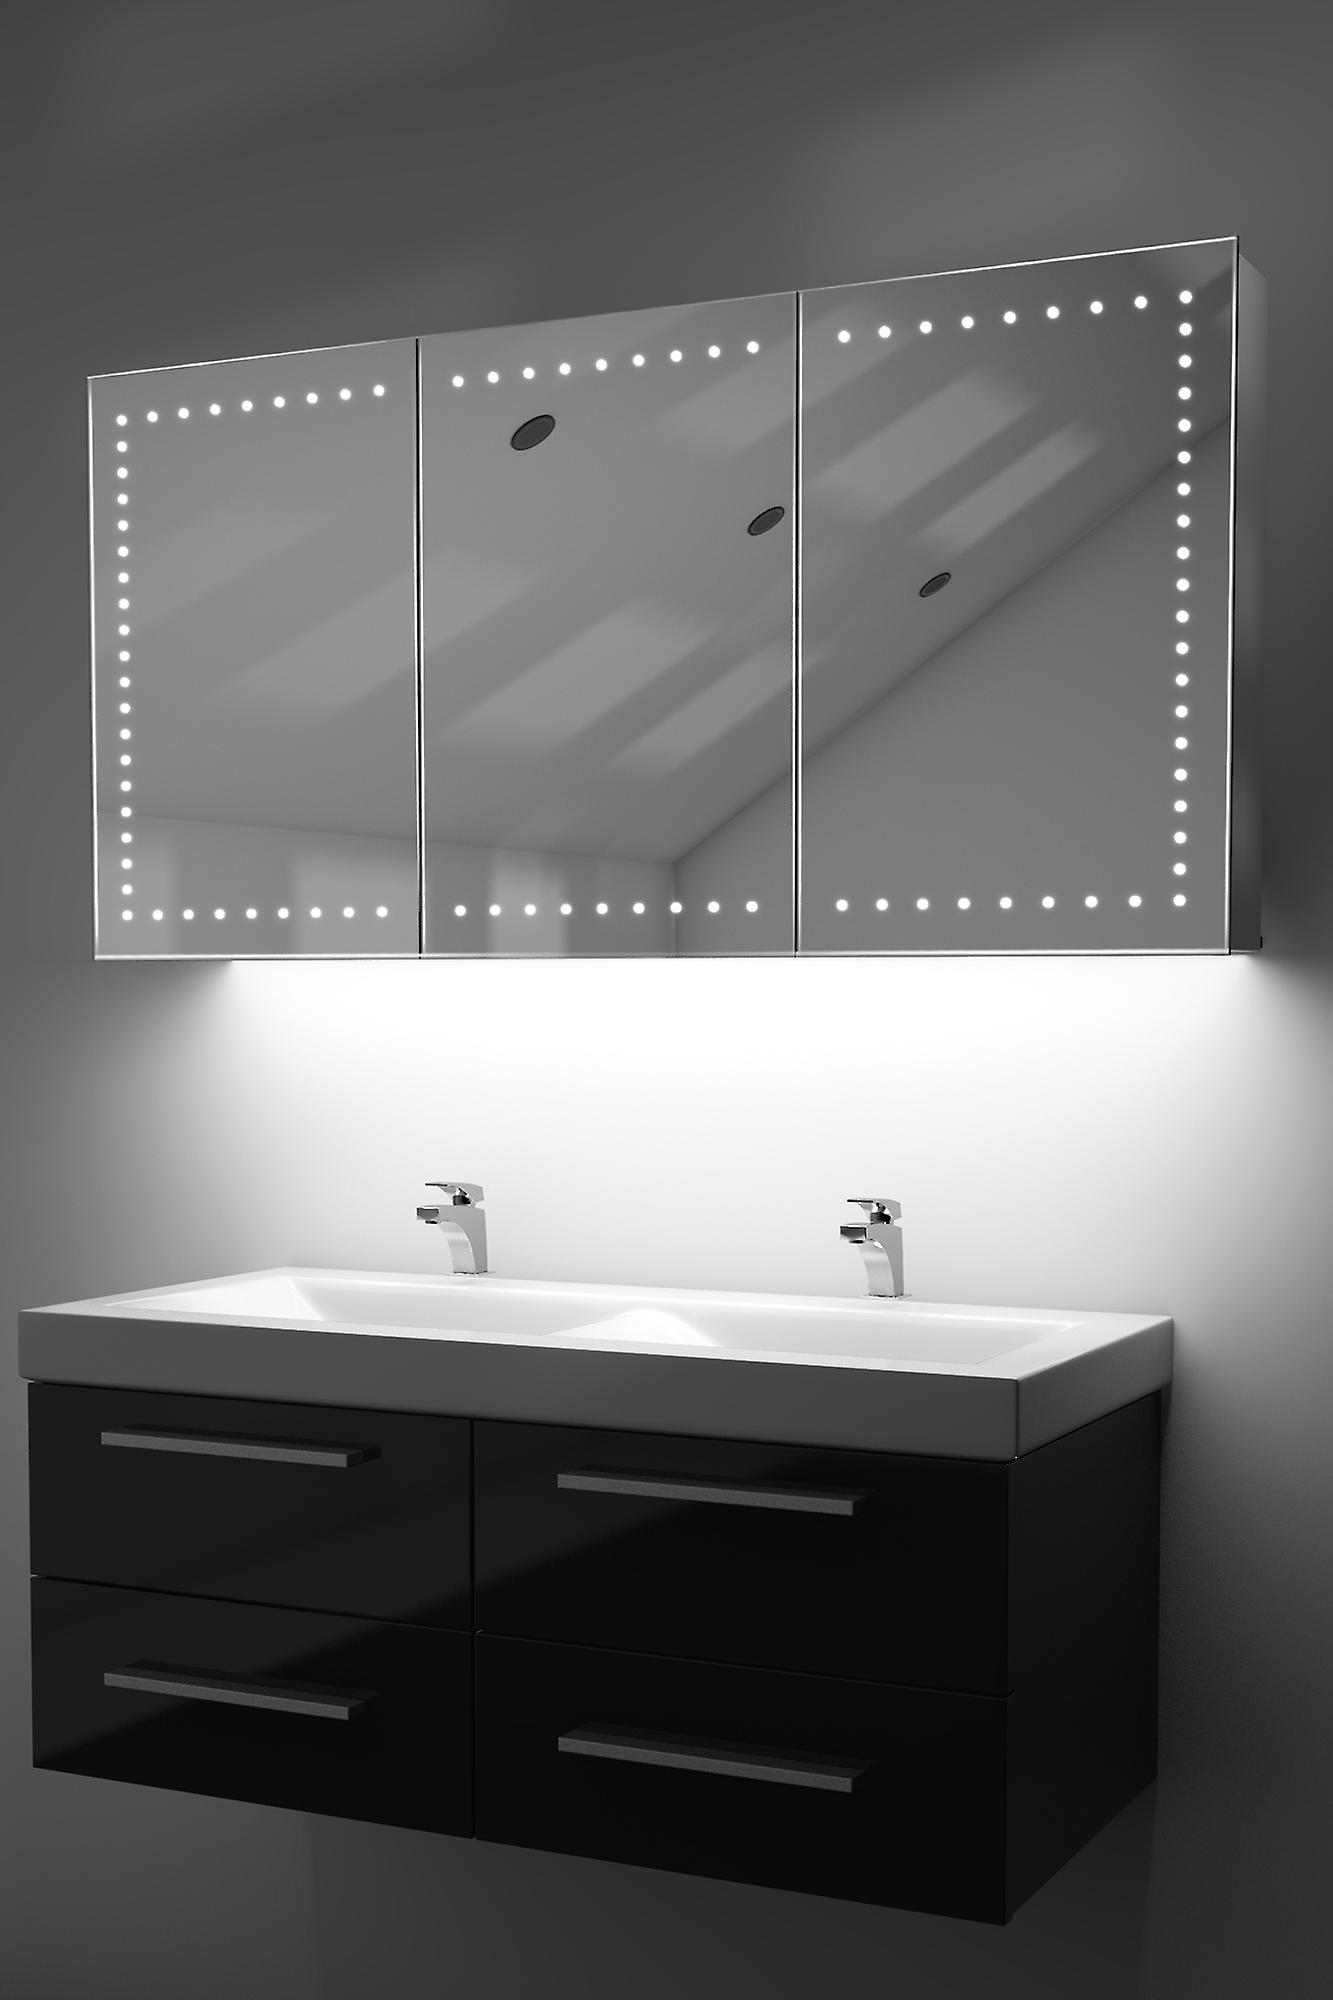 Demist Cabinet With RGB , Sensor & Internal Shaver k377rgb